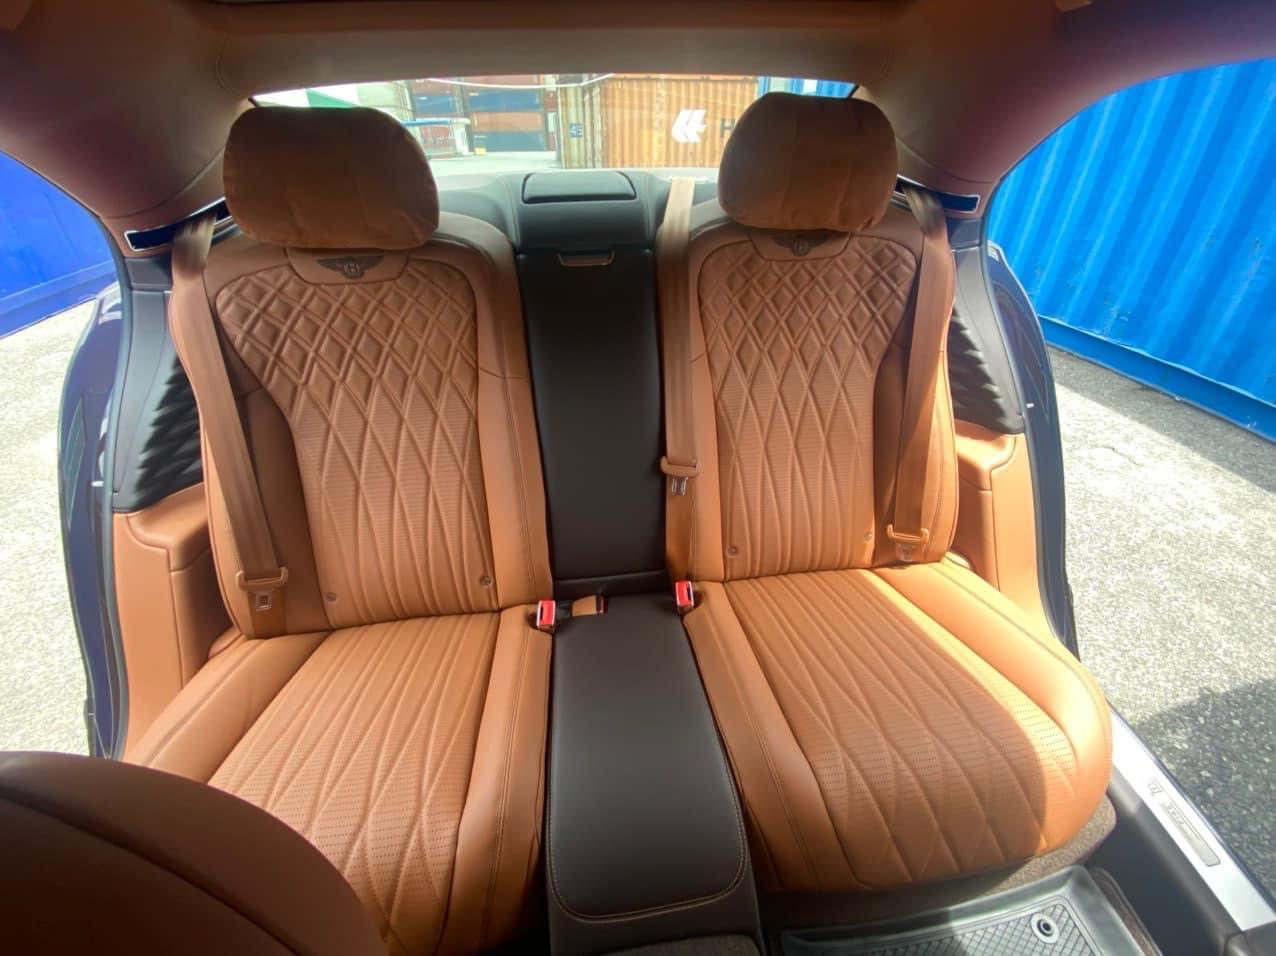 Bentley Flying Spur First Edition one bản full nhất giao ngay sản xuất năm 2021